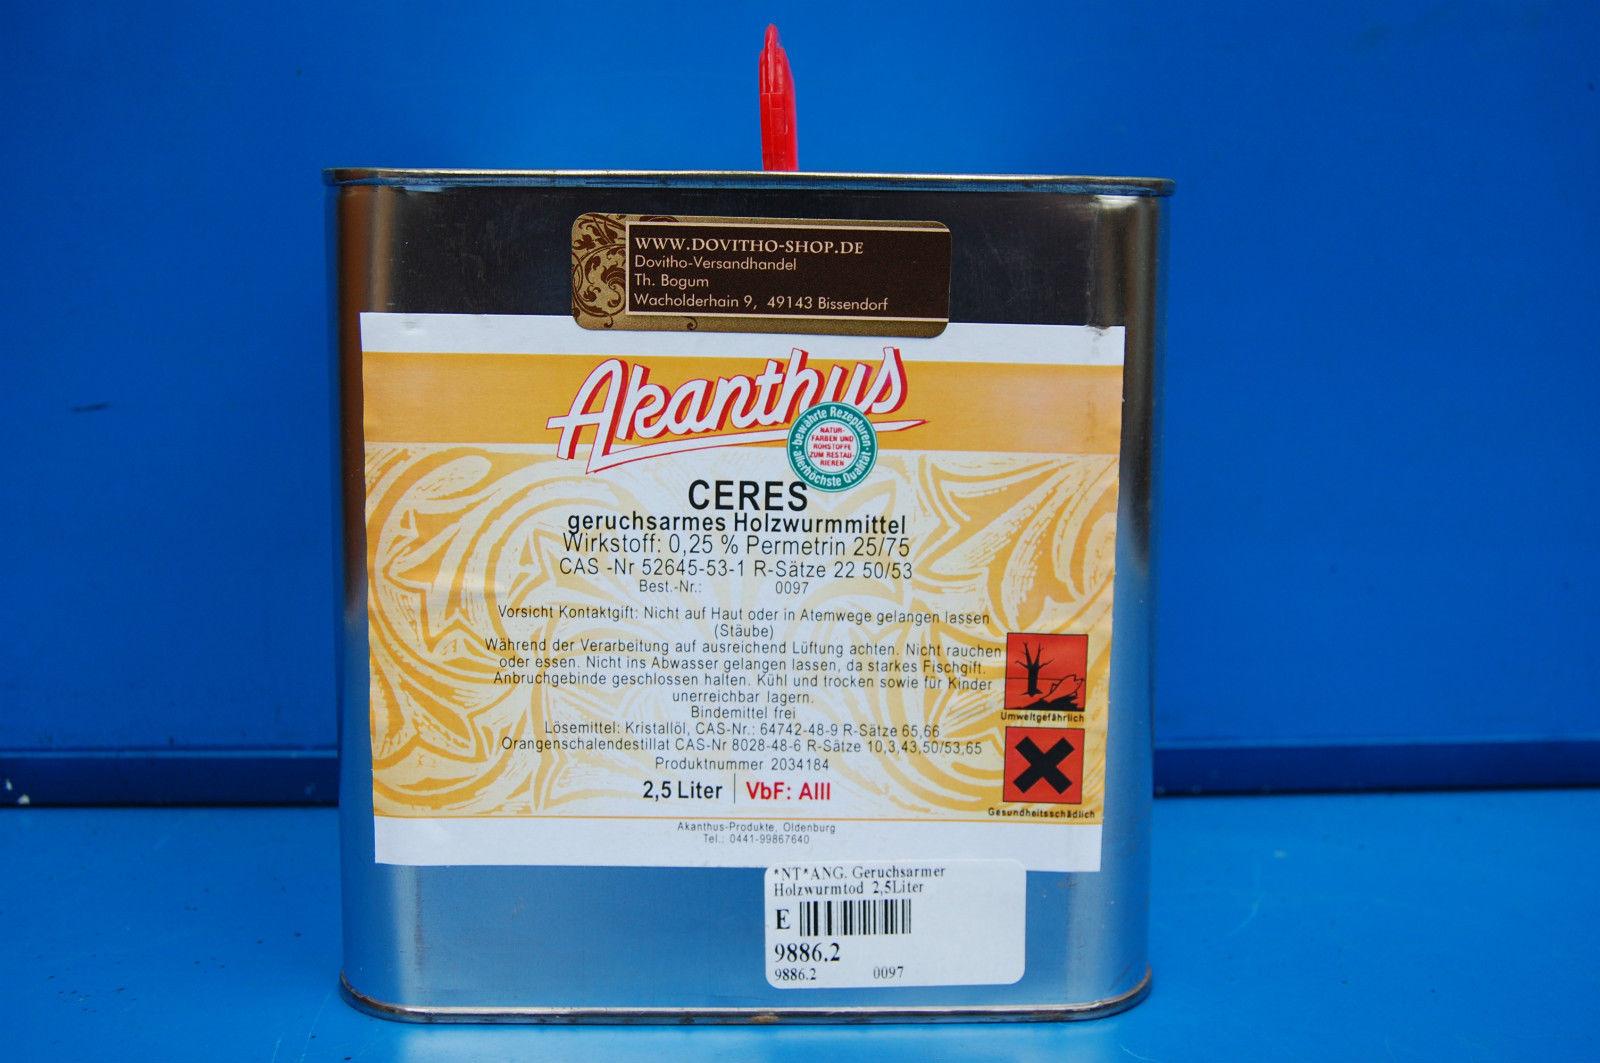 (1 L/ 20,80€) Holzwurmtod Holzwurm Ex Ceres Holzwurmmittel von Akanthus in 2,5 l